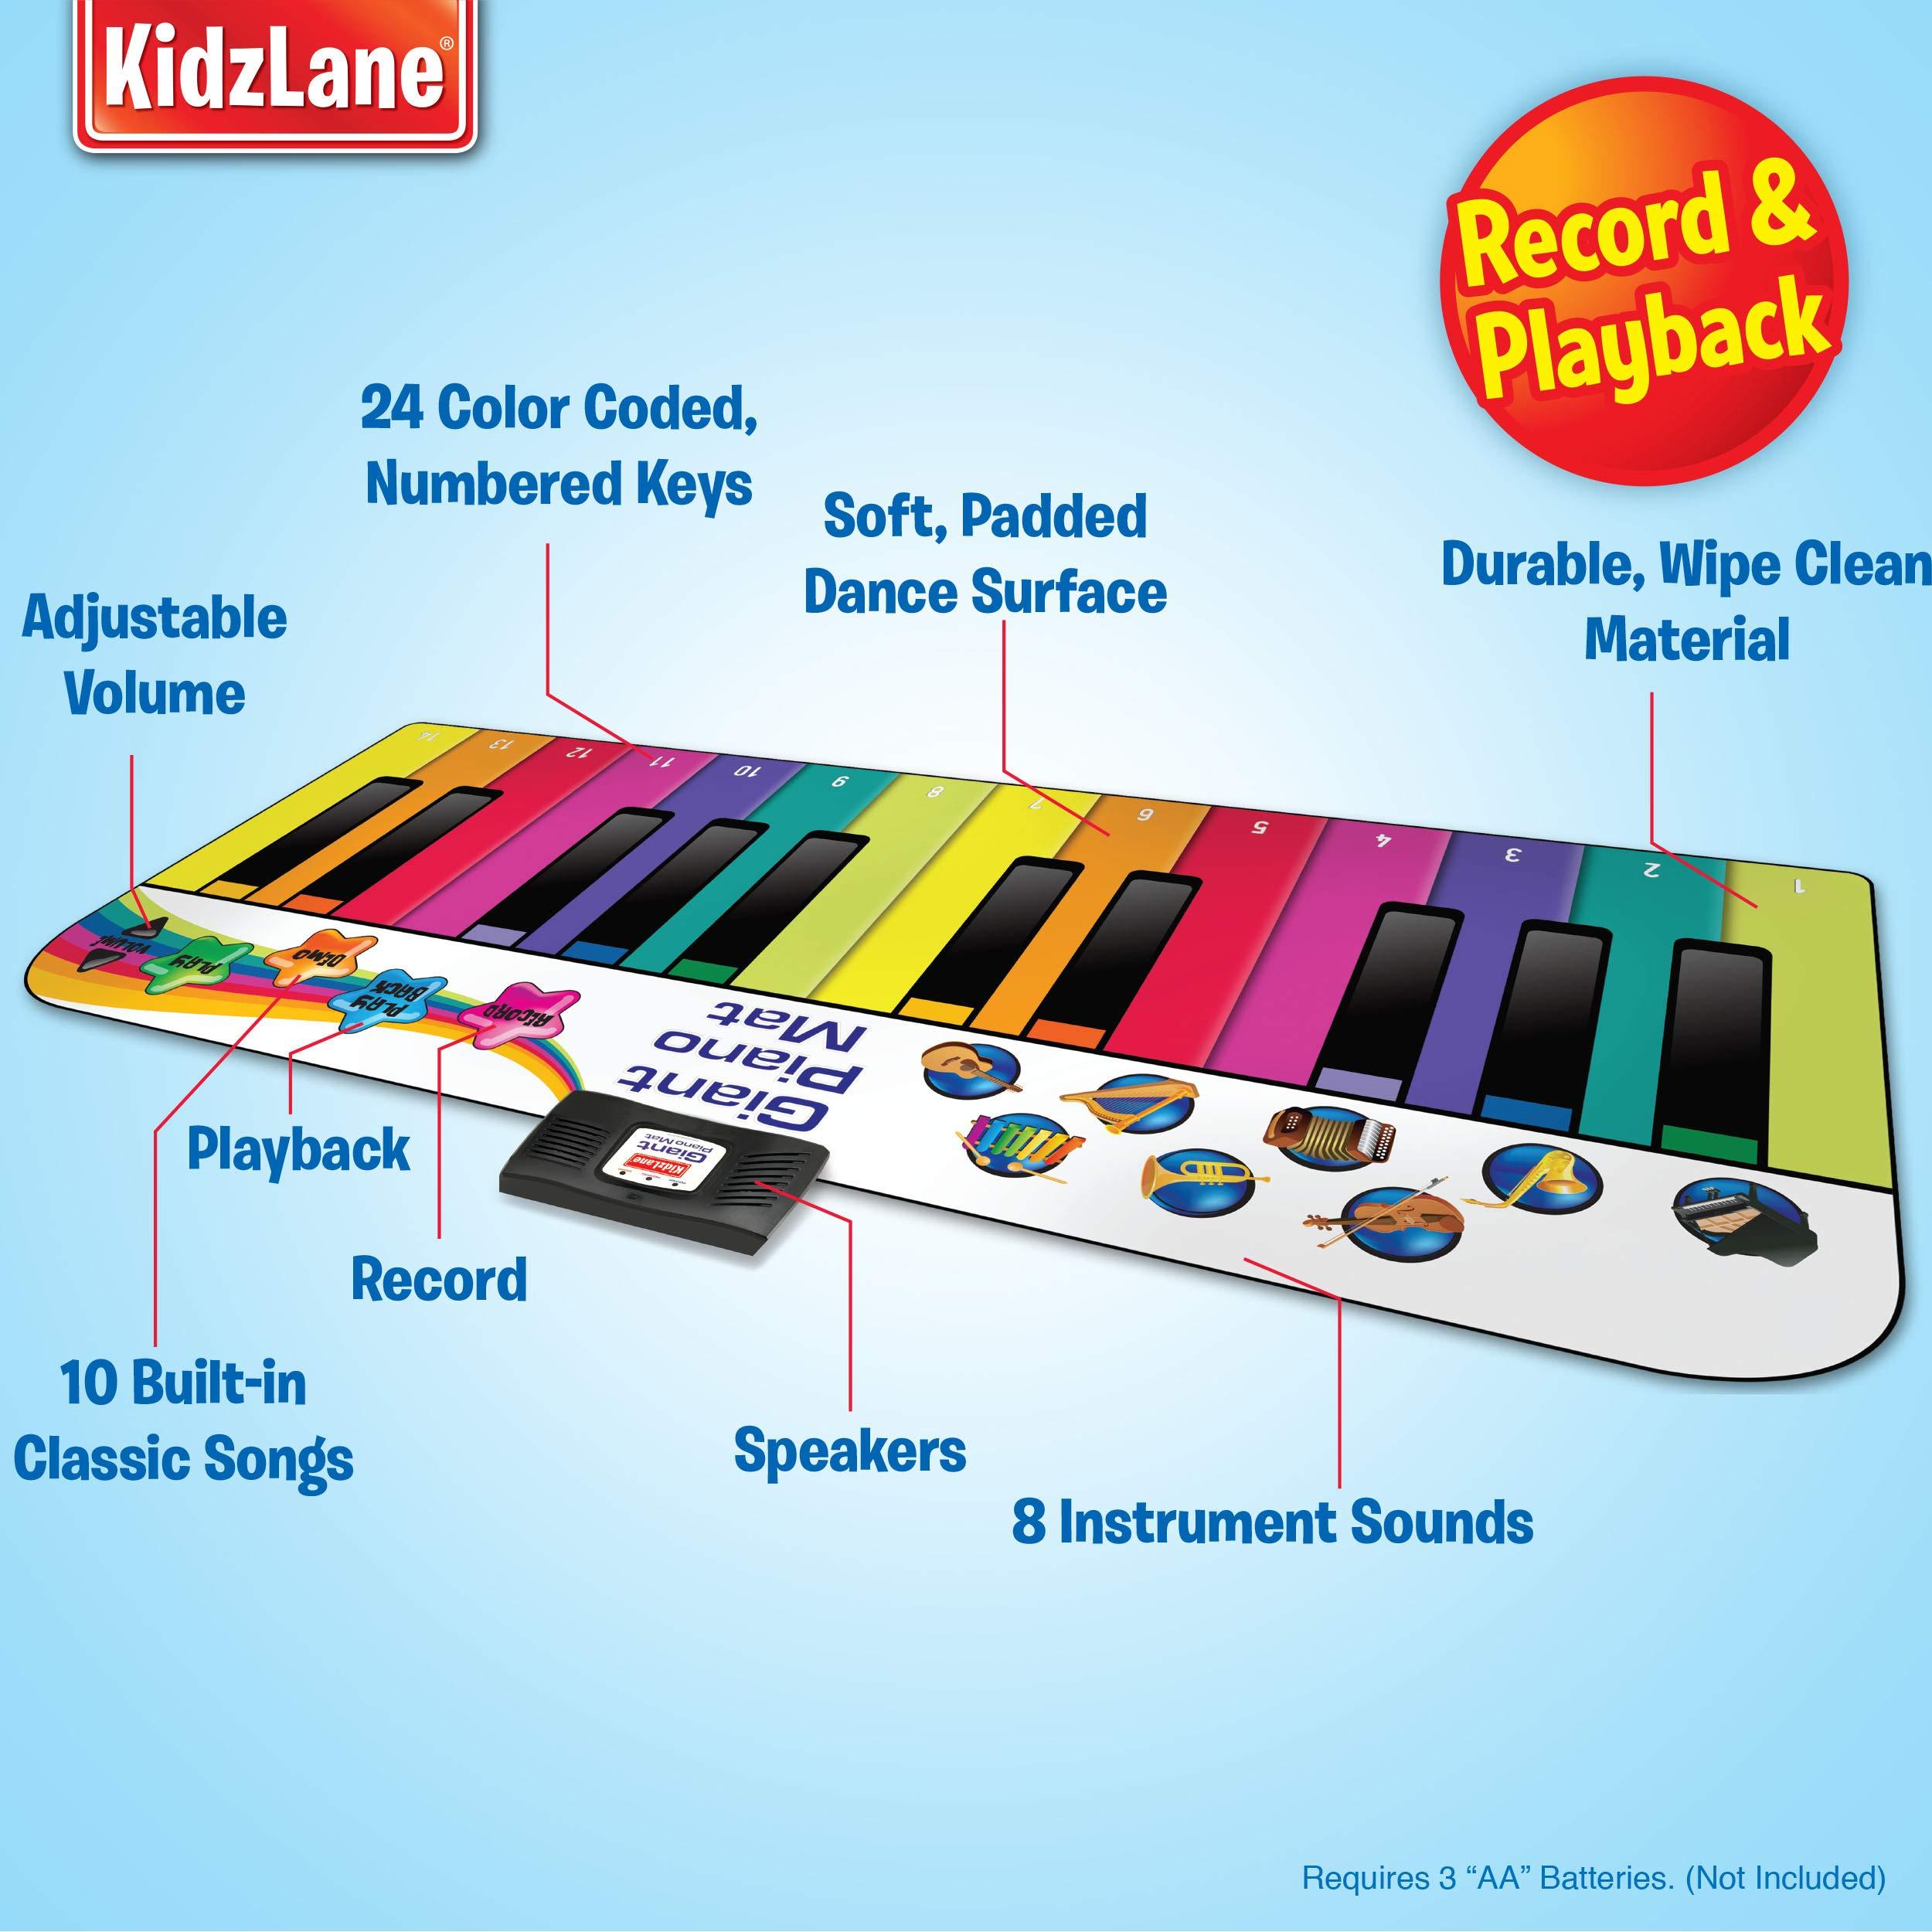 Kidzlane Floor Piano Mat: Jumbo 6 Foot Musical Keyboard Playmat for Toddlers and Kids by Kidzlane (Image #3)